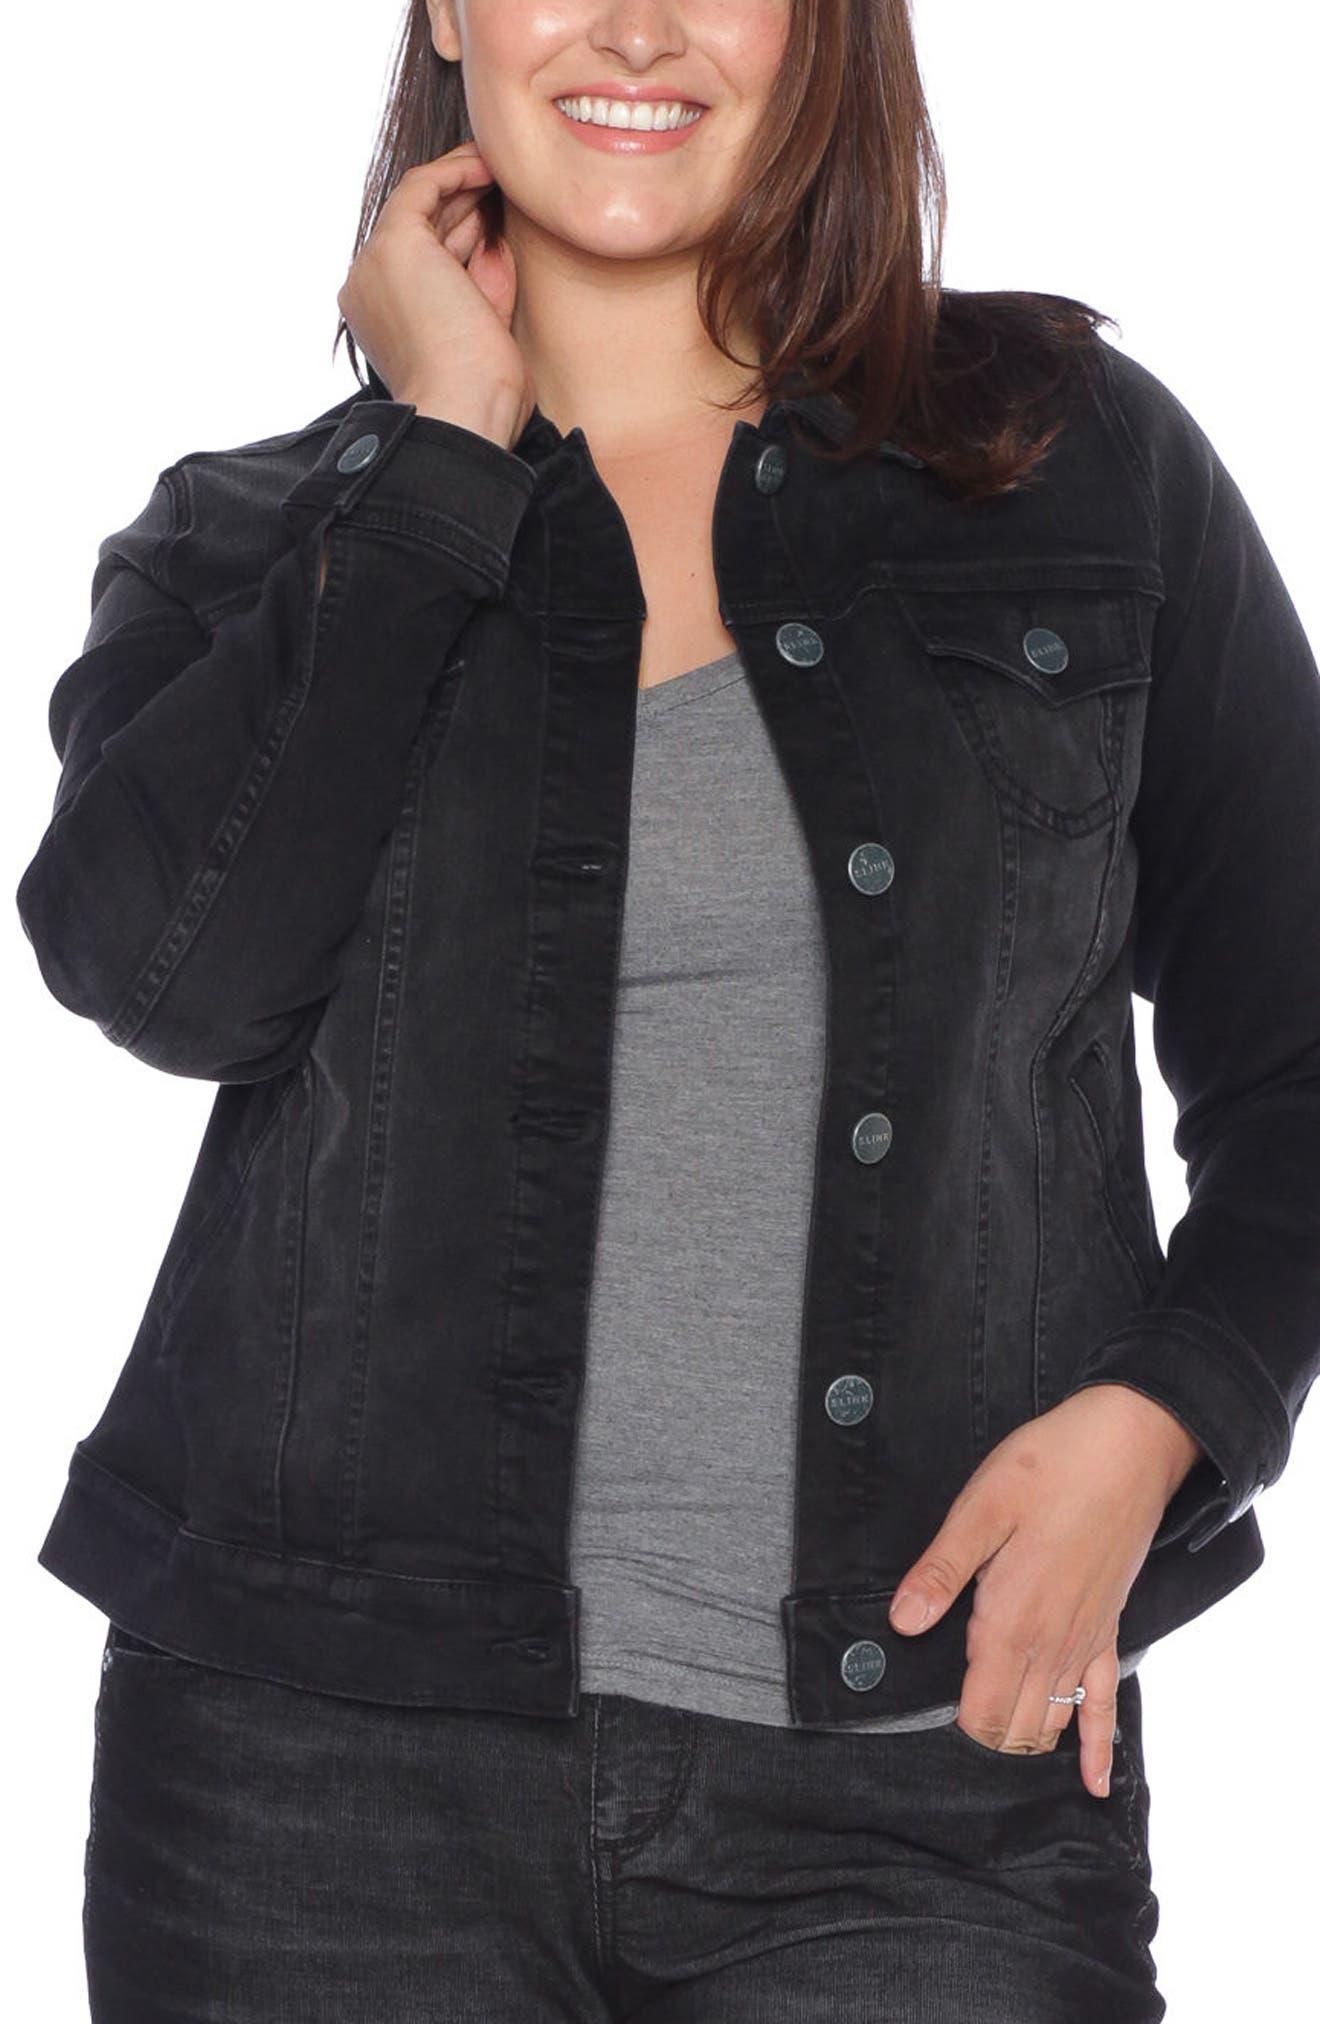 Alternate Image 1 Selected - SLINK Jeans Denim Trucker Jacket (Plus Size)